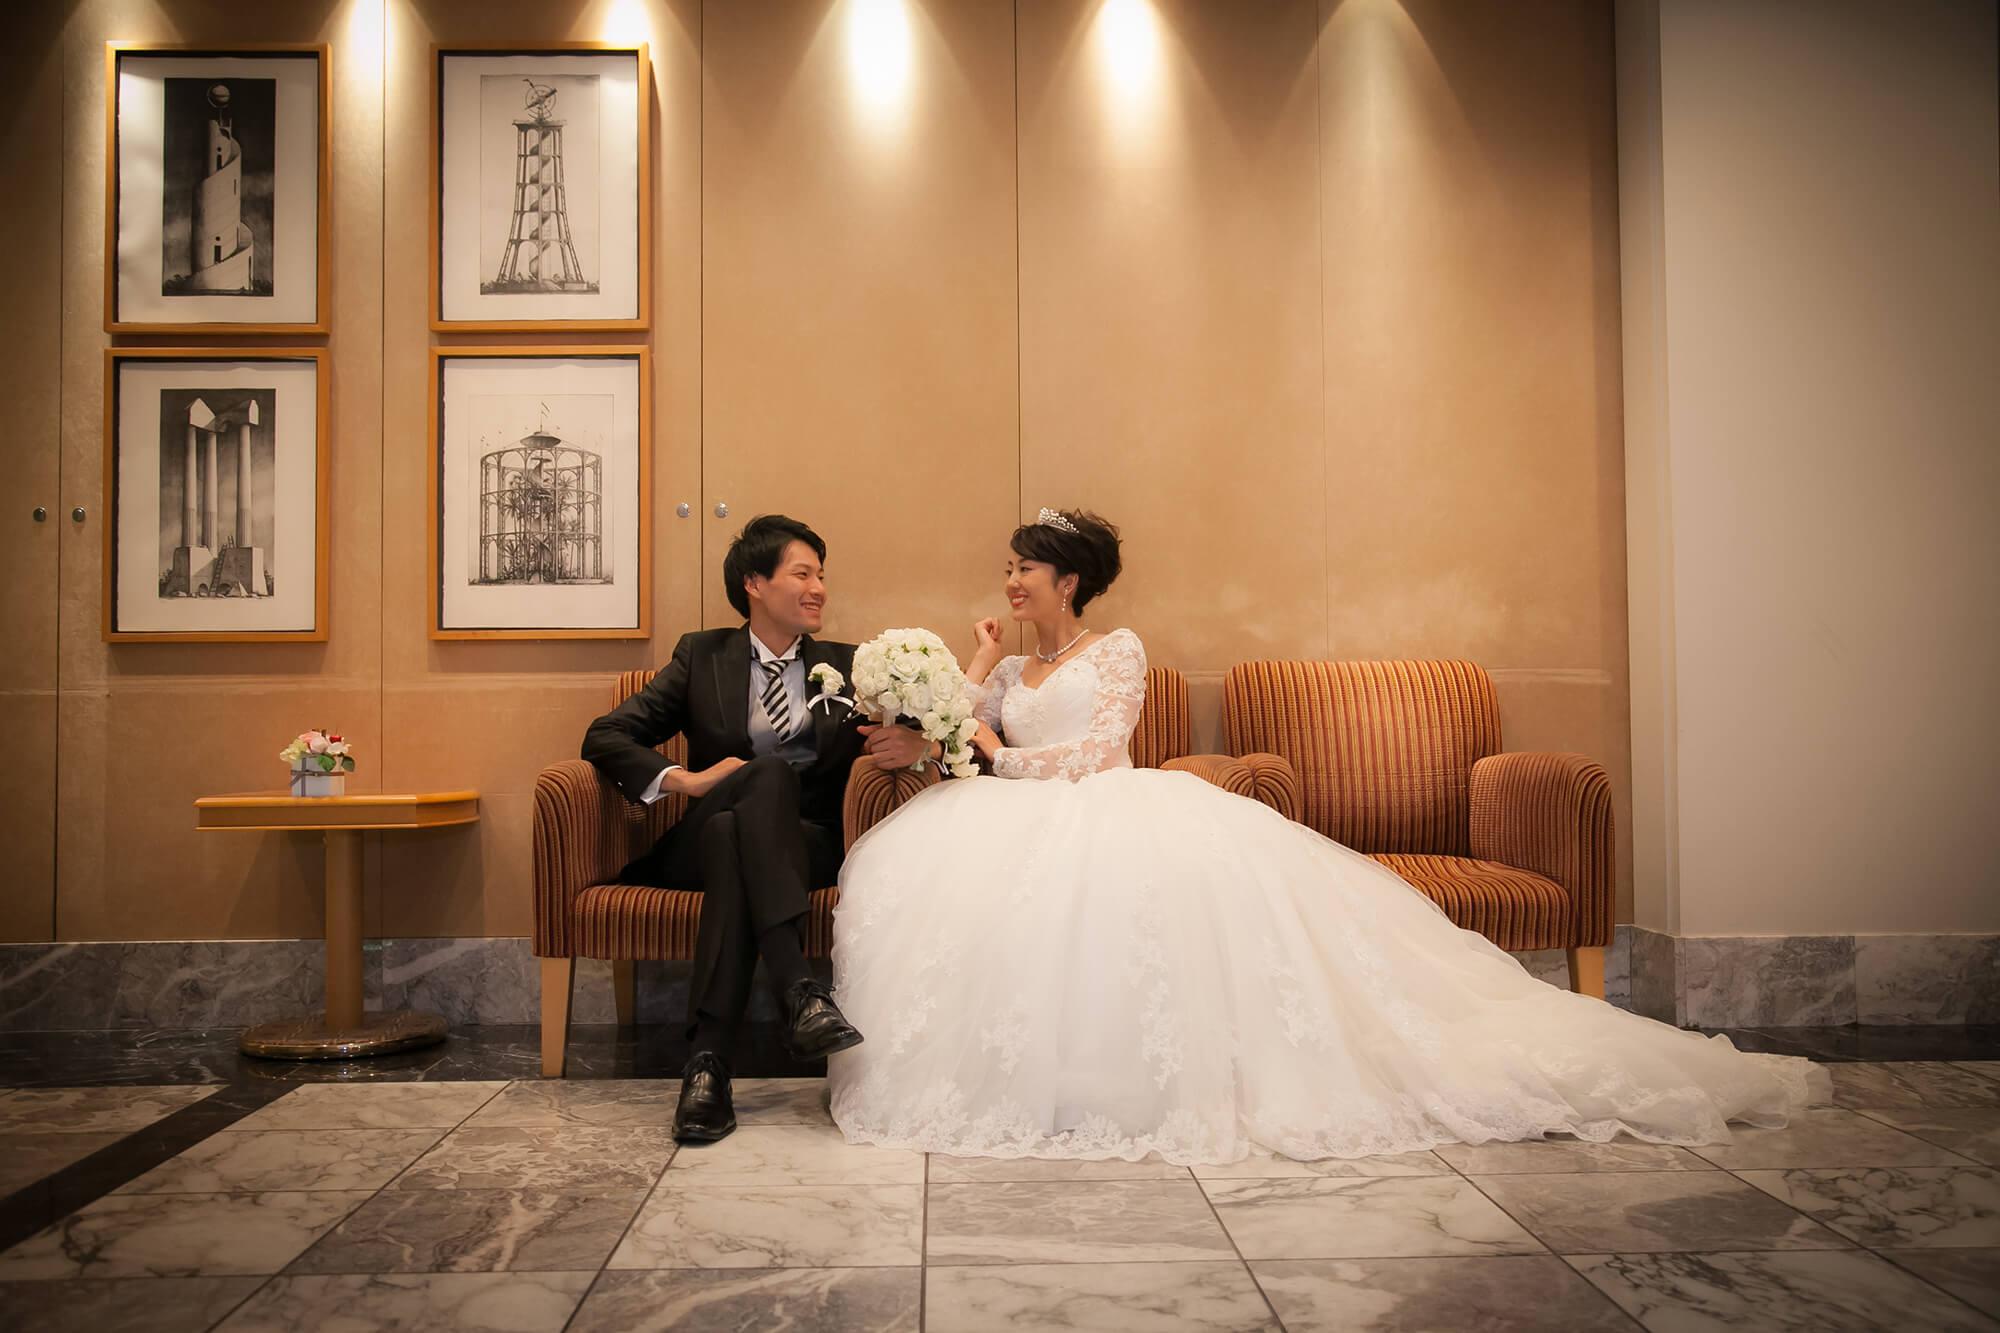 Coming Soon…|ウエディングレポート|レンブラントホテル海老名(旧オークラフロンティアホテル海老名)【公式】婚礼サイト